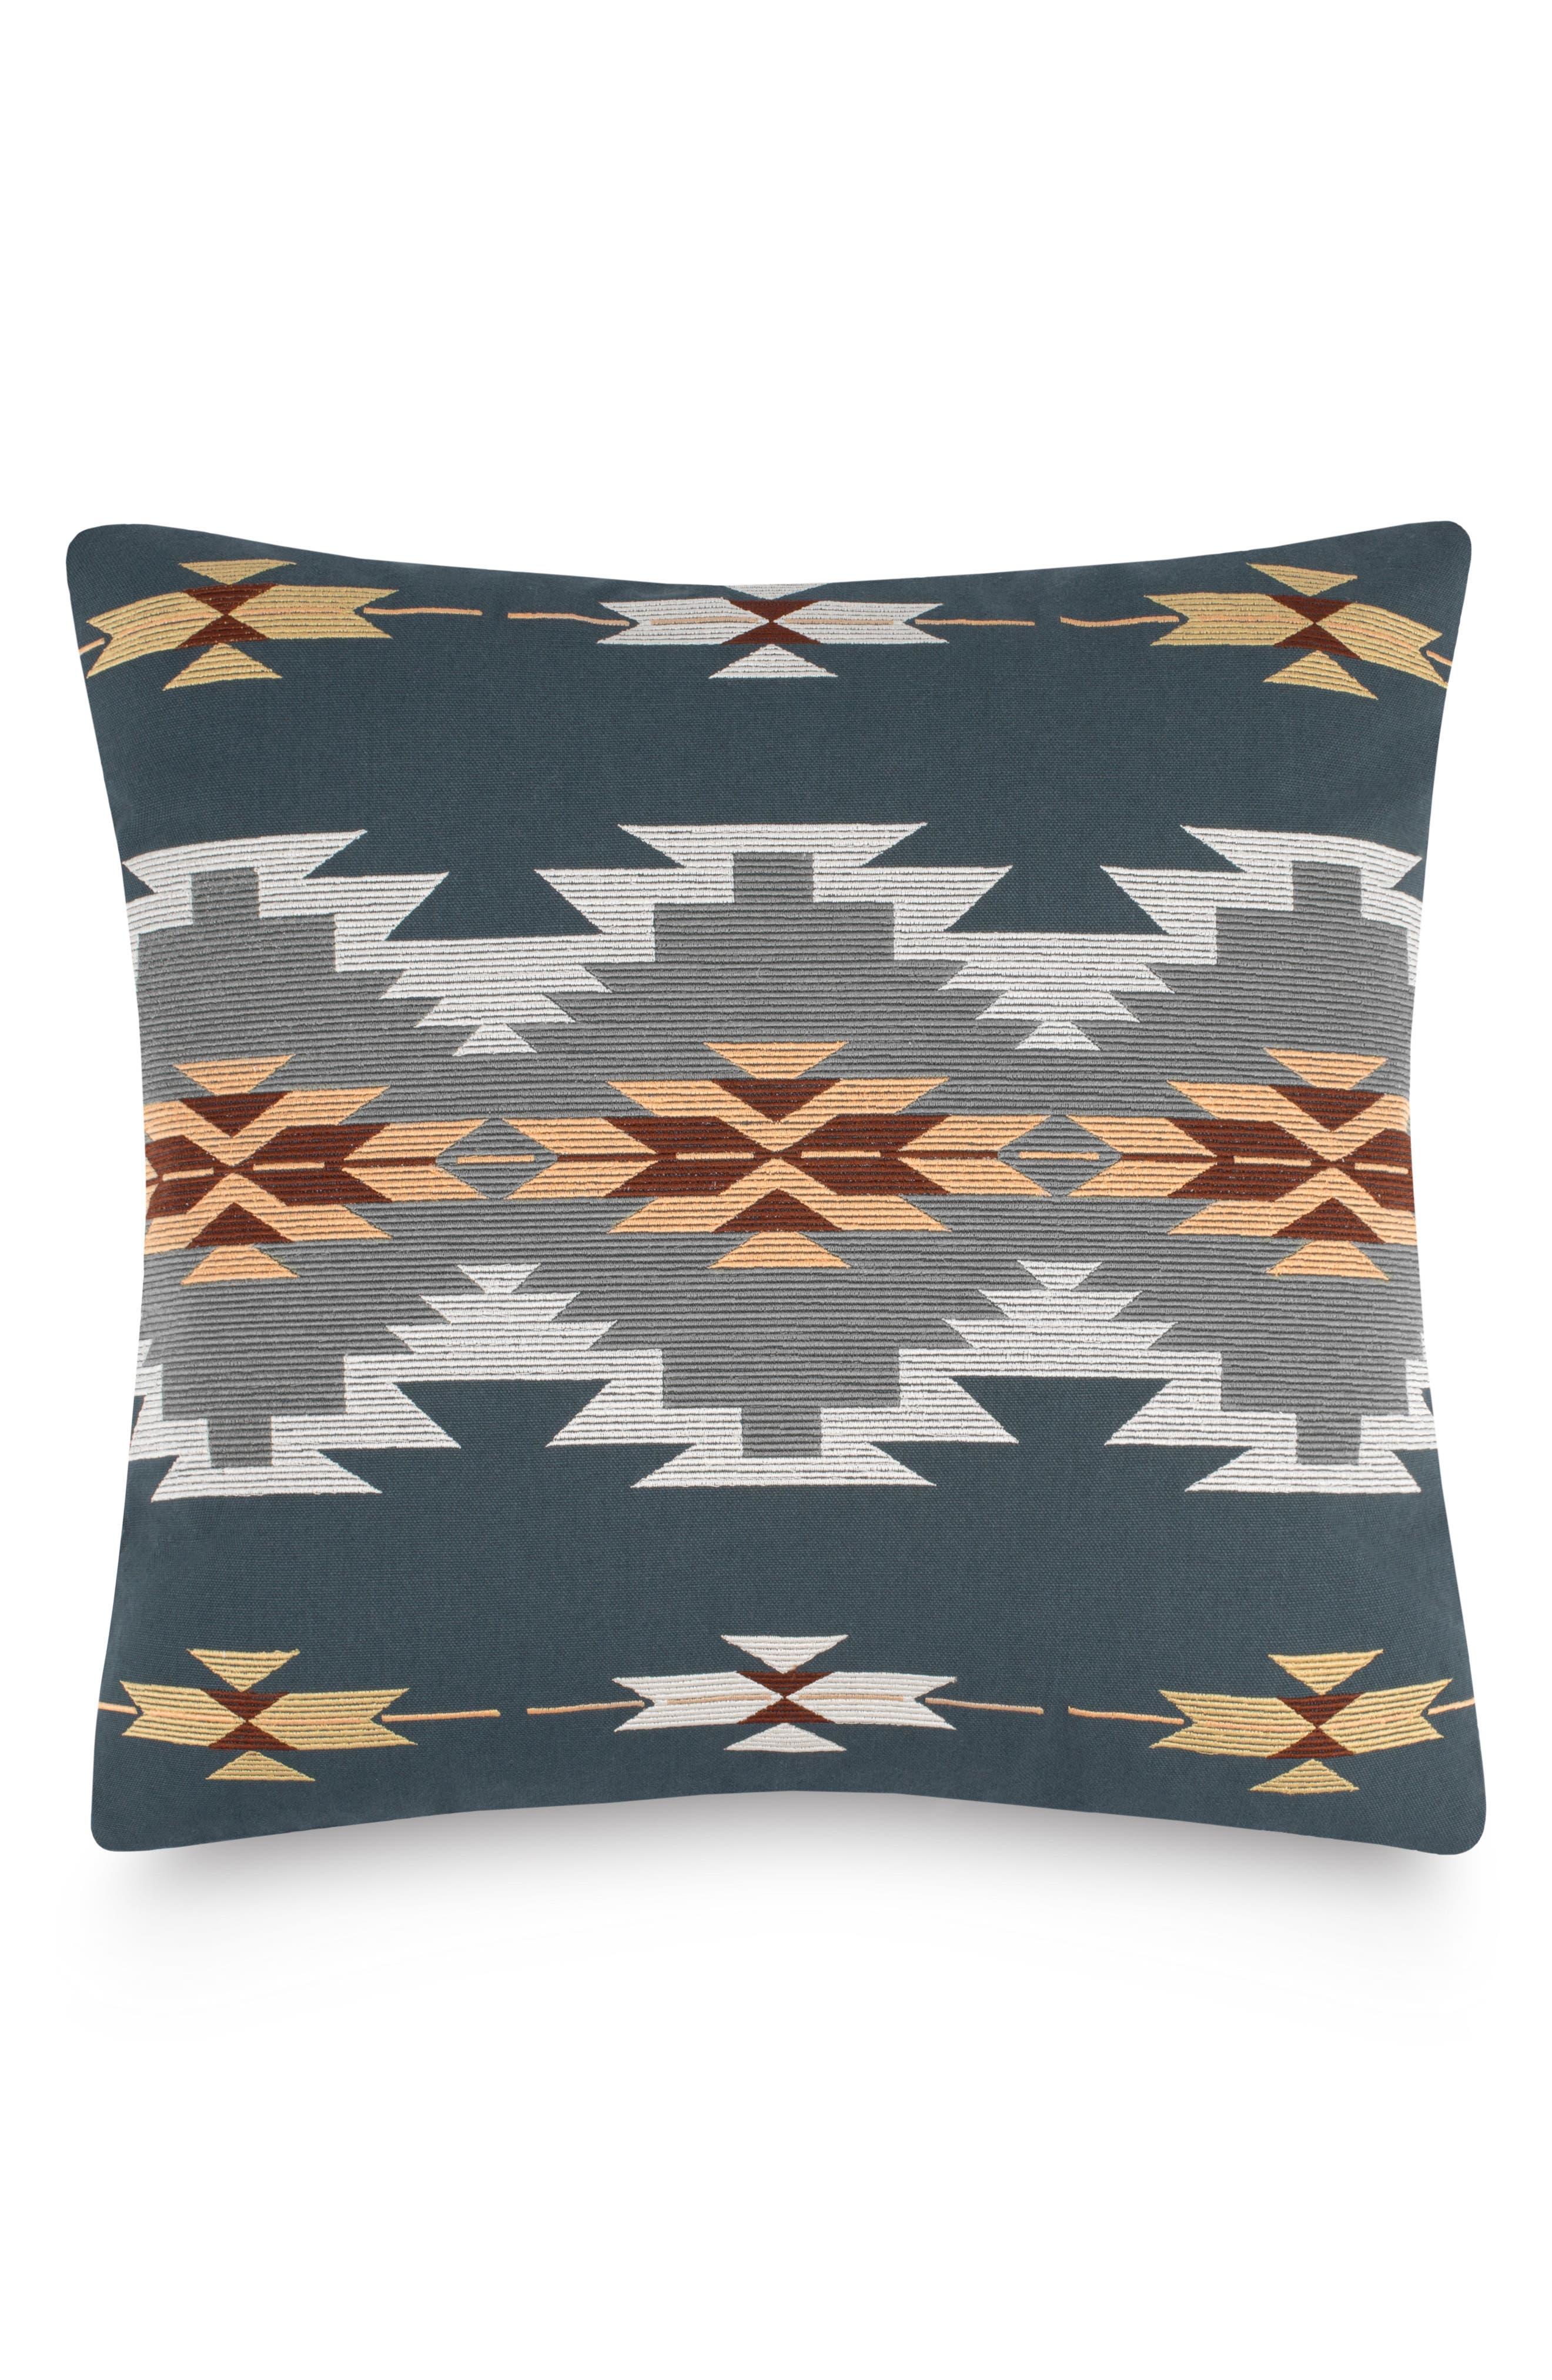 Crystal Peak Accent Pillow,                             Main thumbnail 1, color,                             Dark Slate